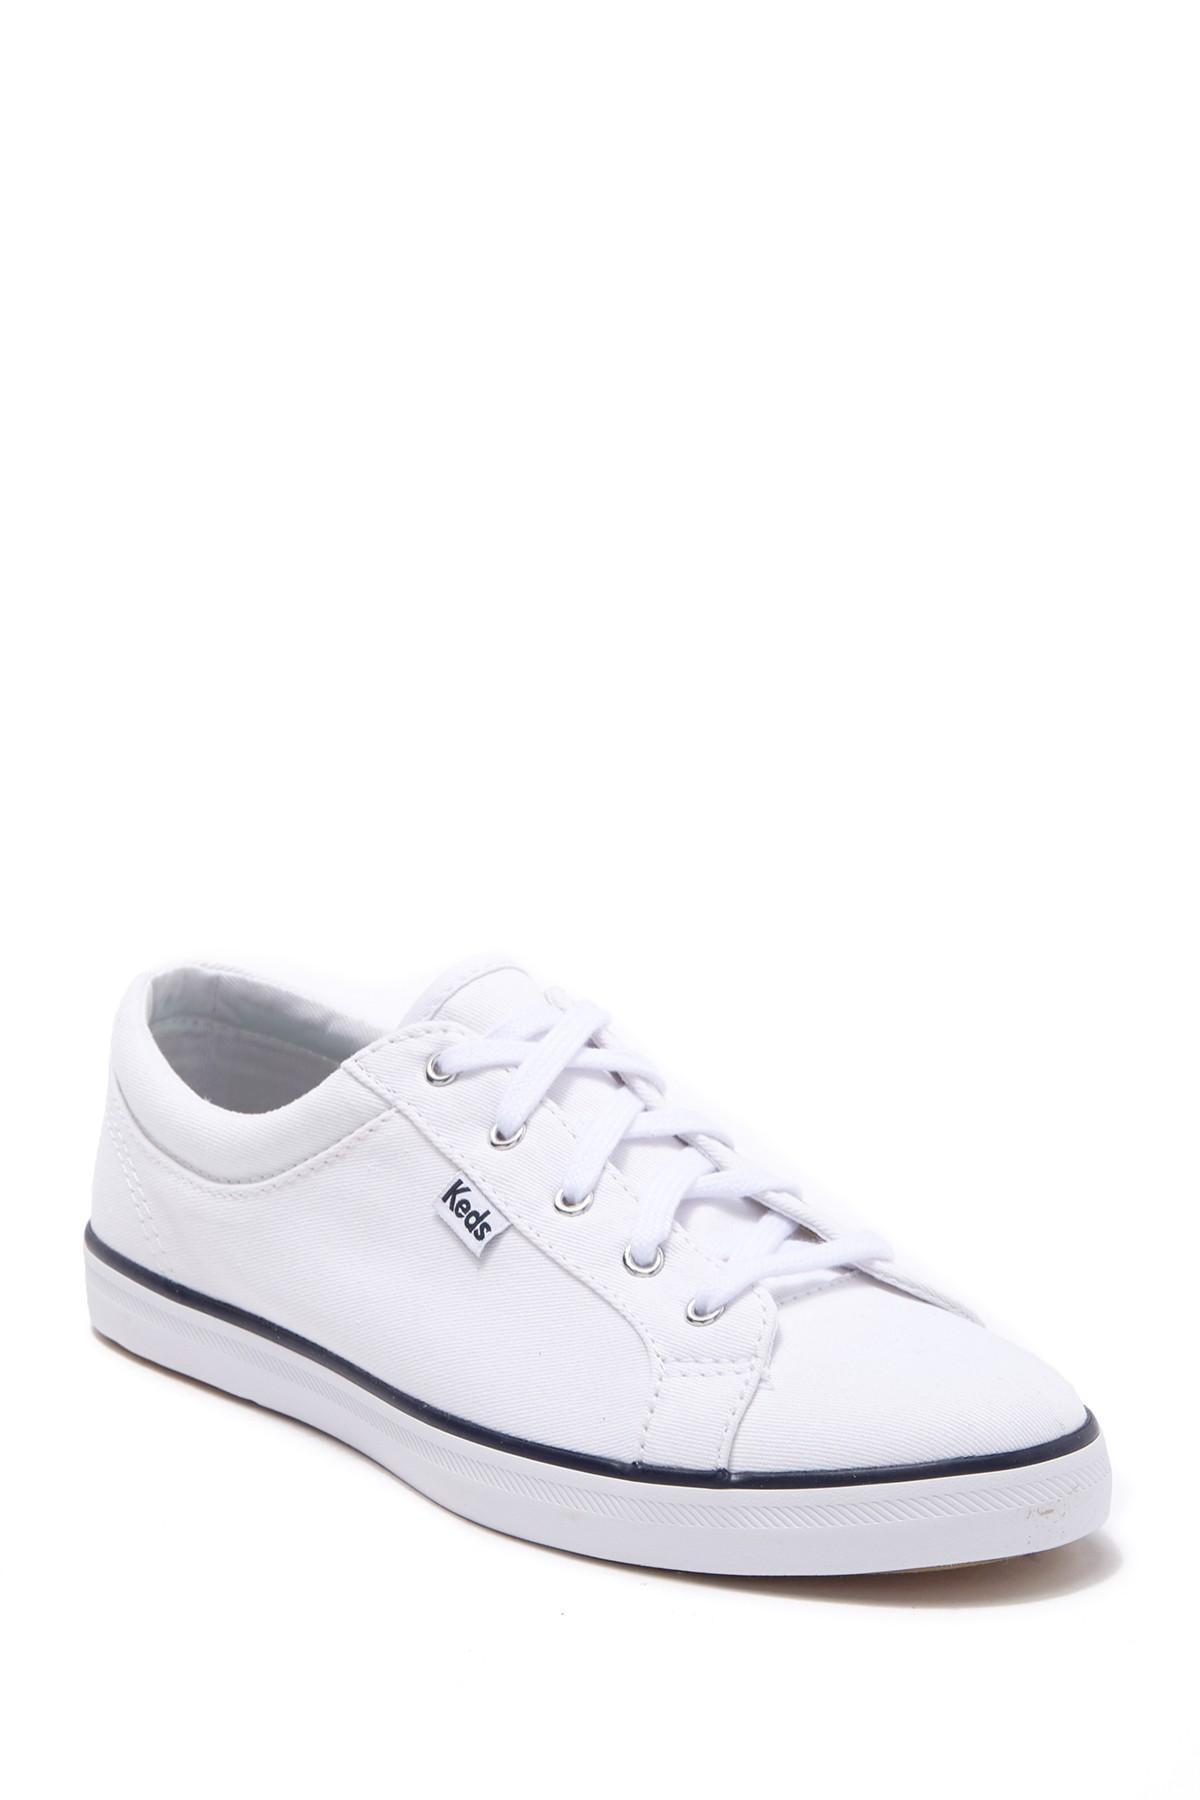 Keds Canvas Maven Twill Sneaker in